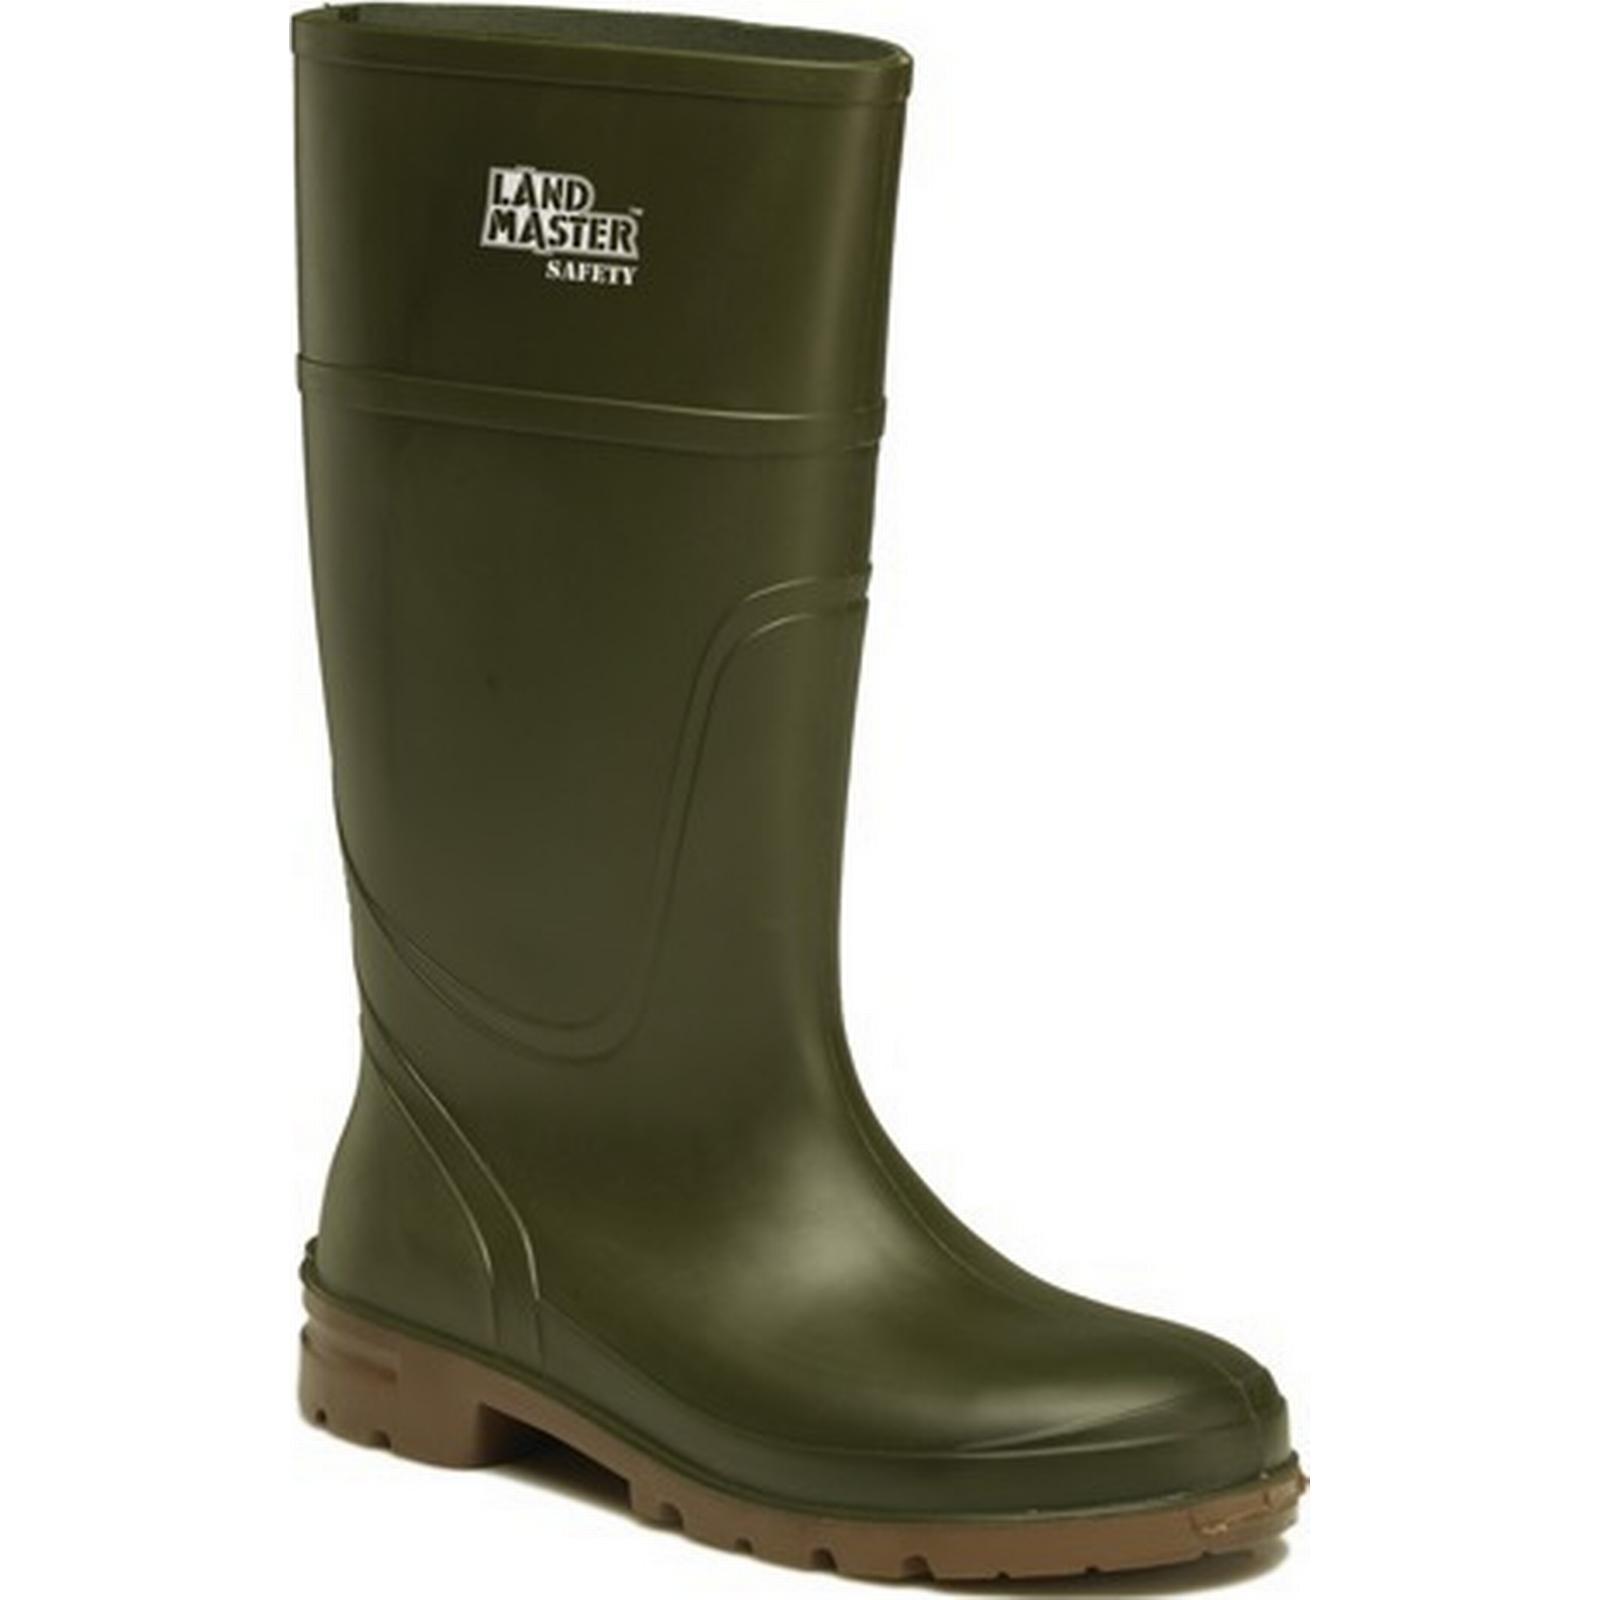 Dickies Workwear Safety Landmaster Wellington Boot Green / Size Size / 10 bc44de